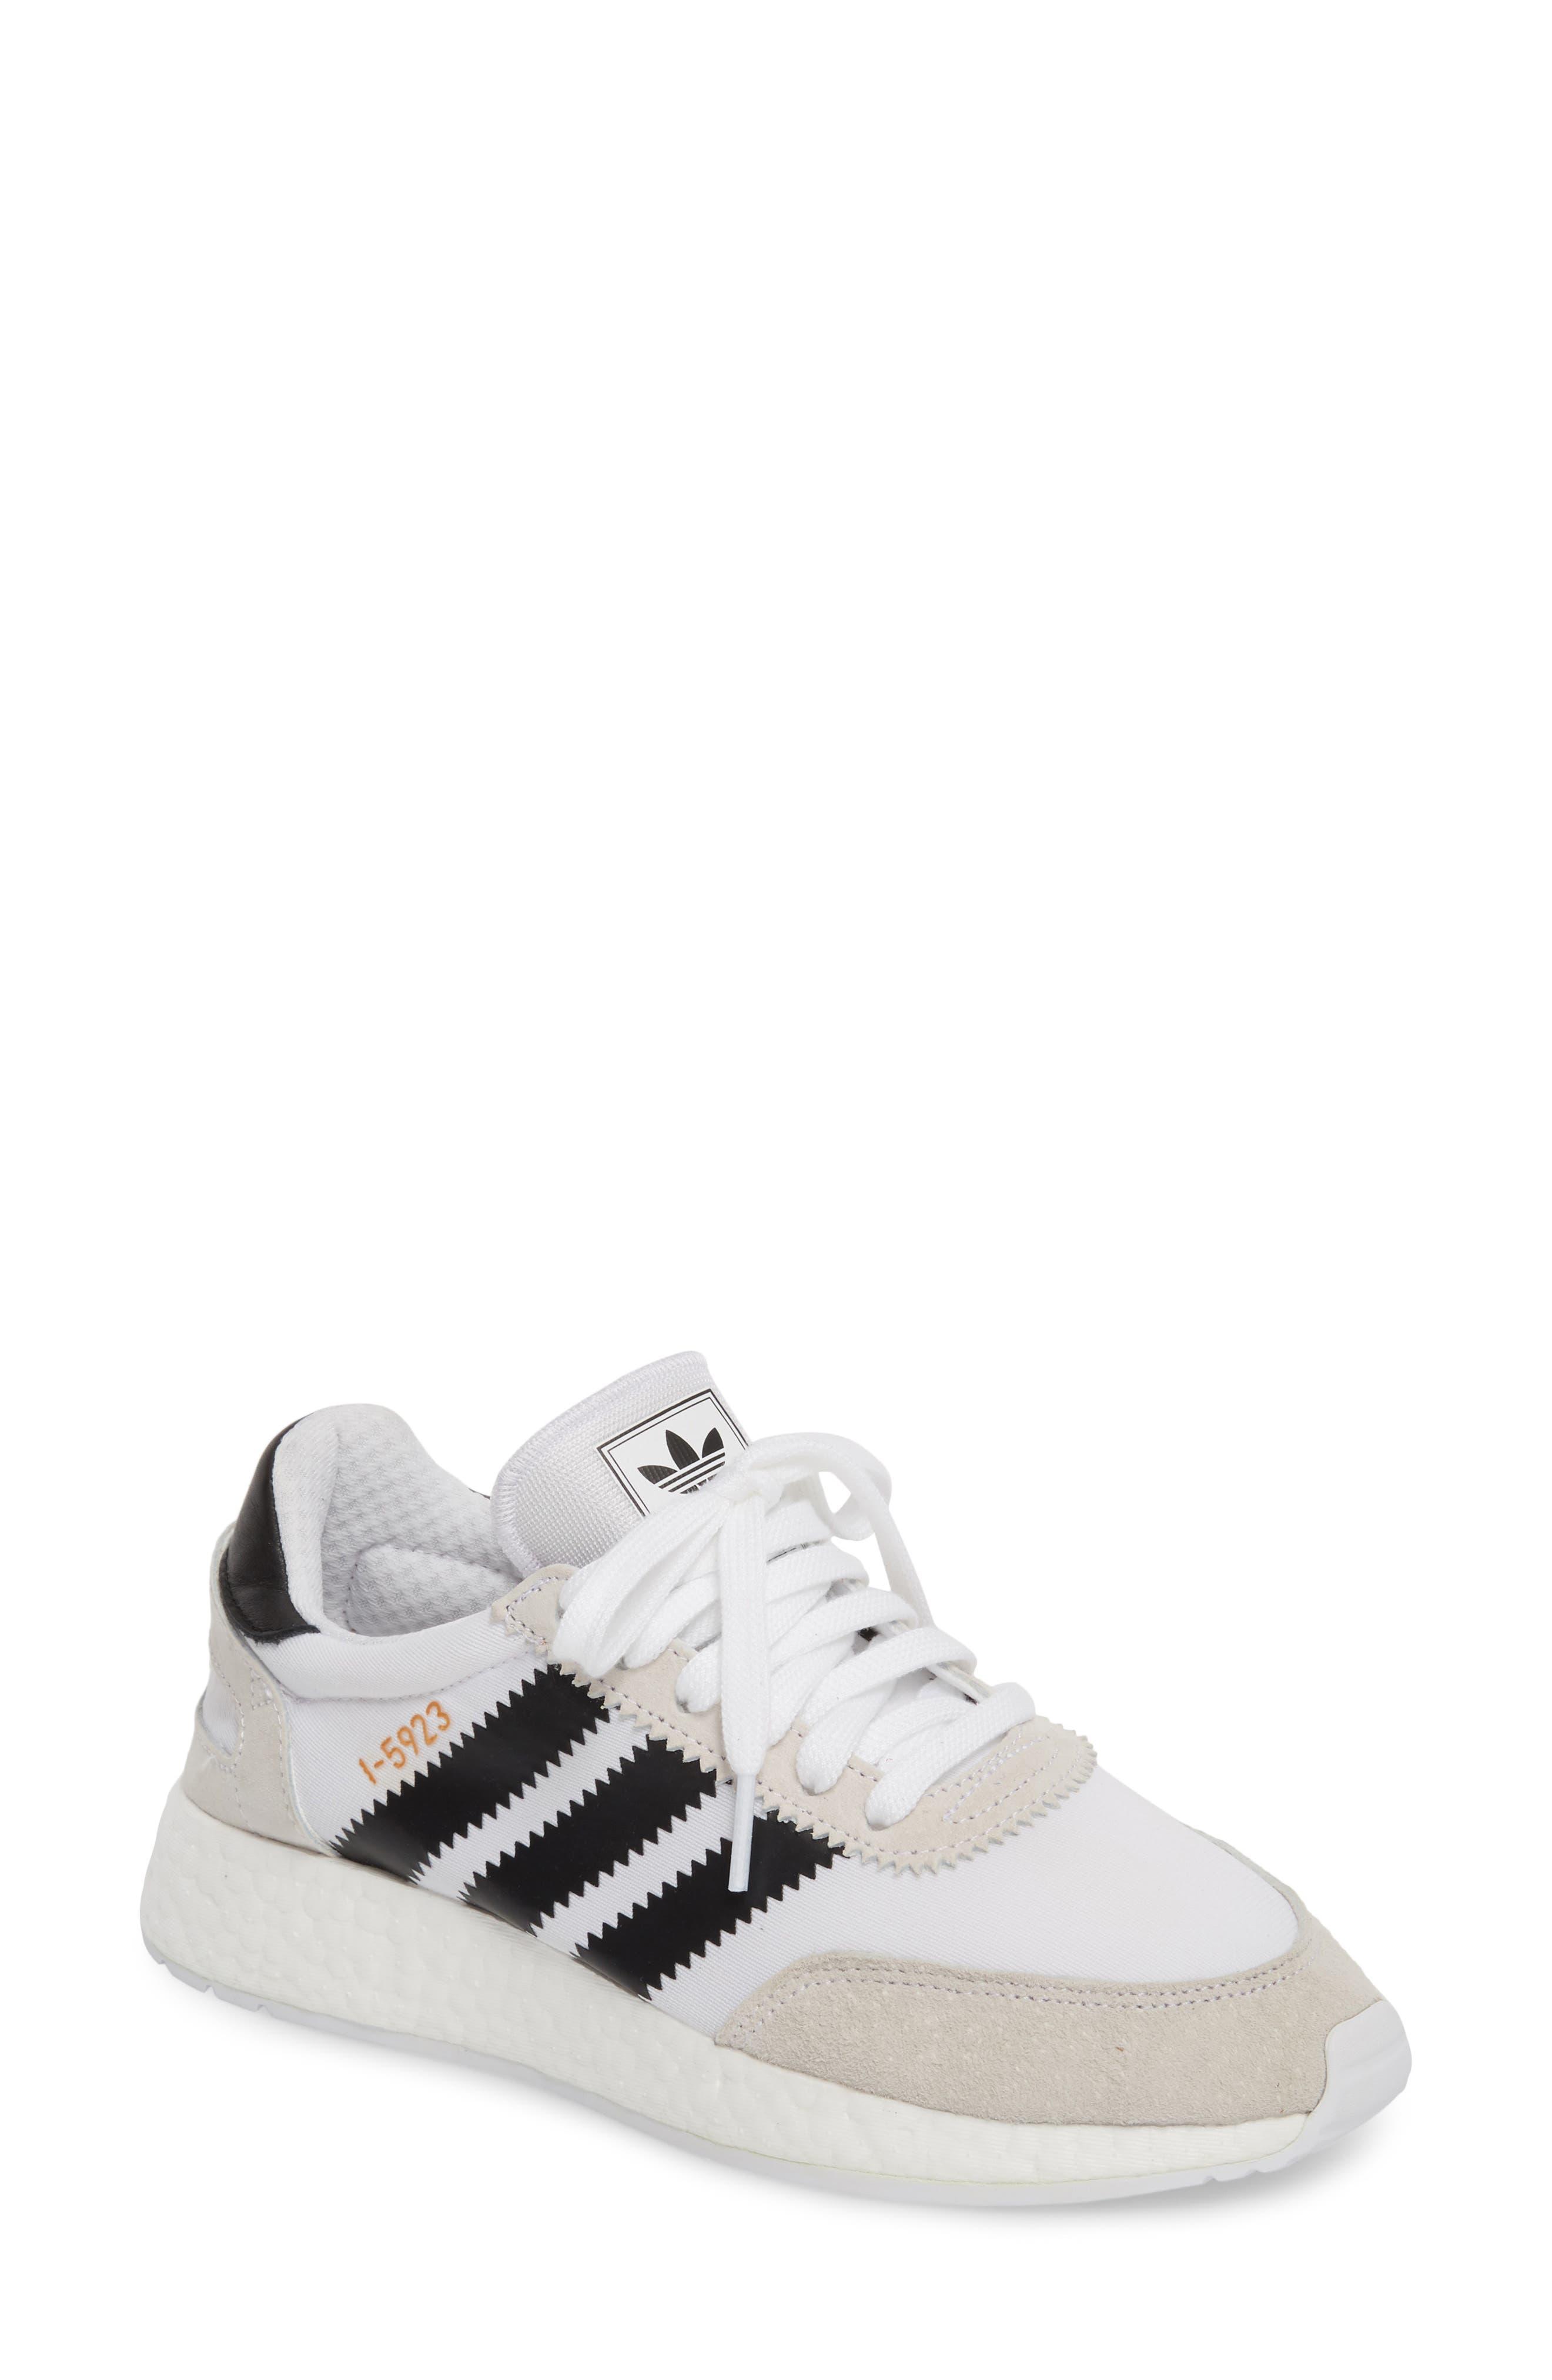 I-5923 Sneaker,                             Main thumbnail 5, color,